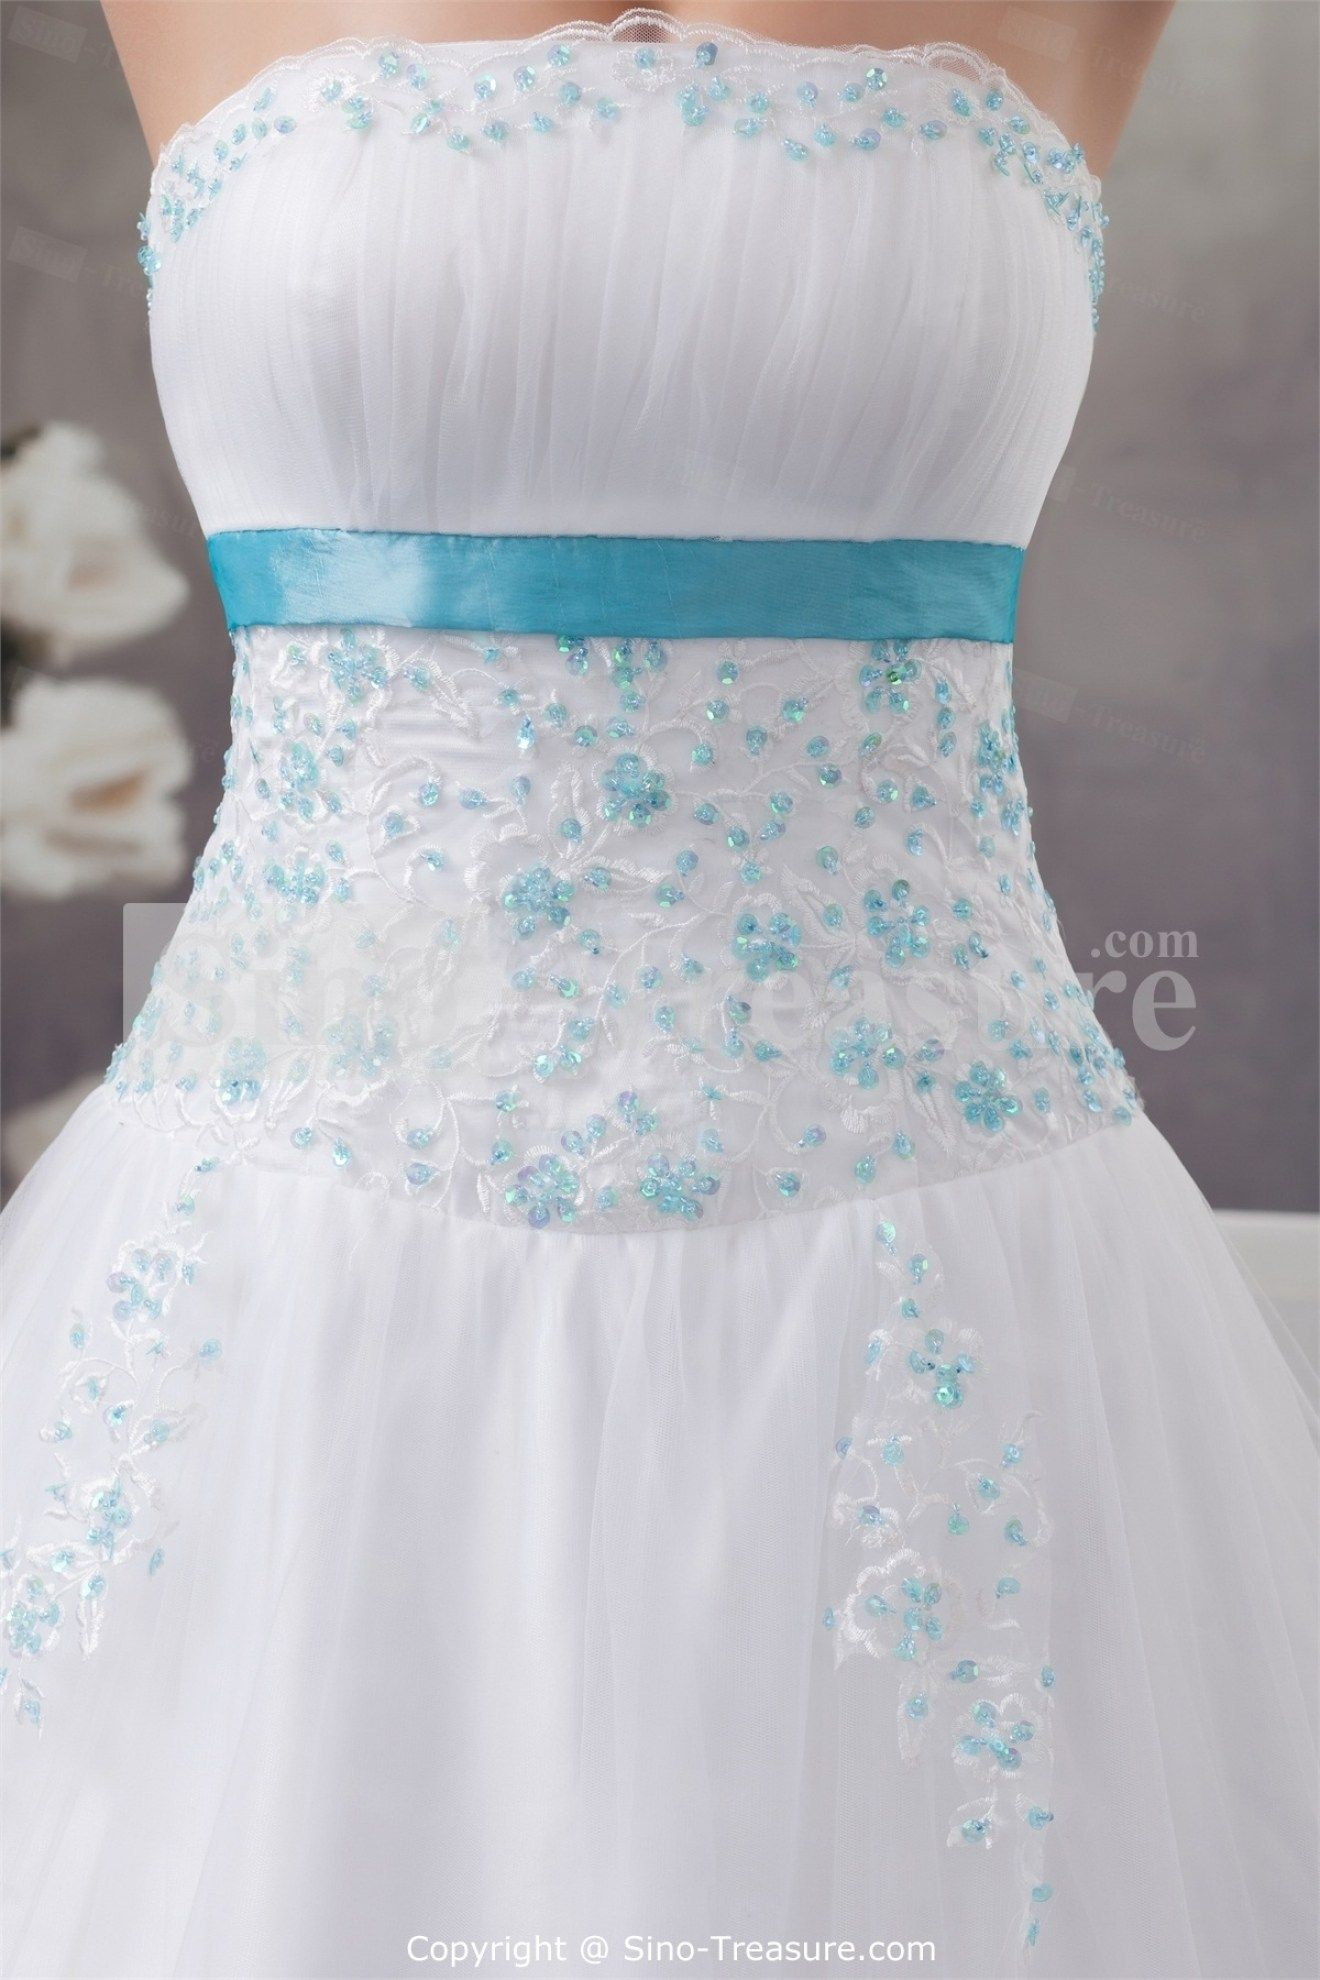 34 Beautiful Light Blue And White Wedding Dresses | White wedding ...